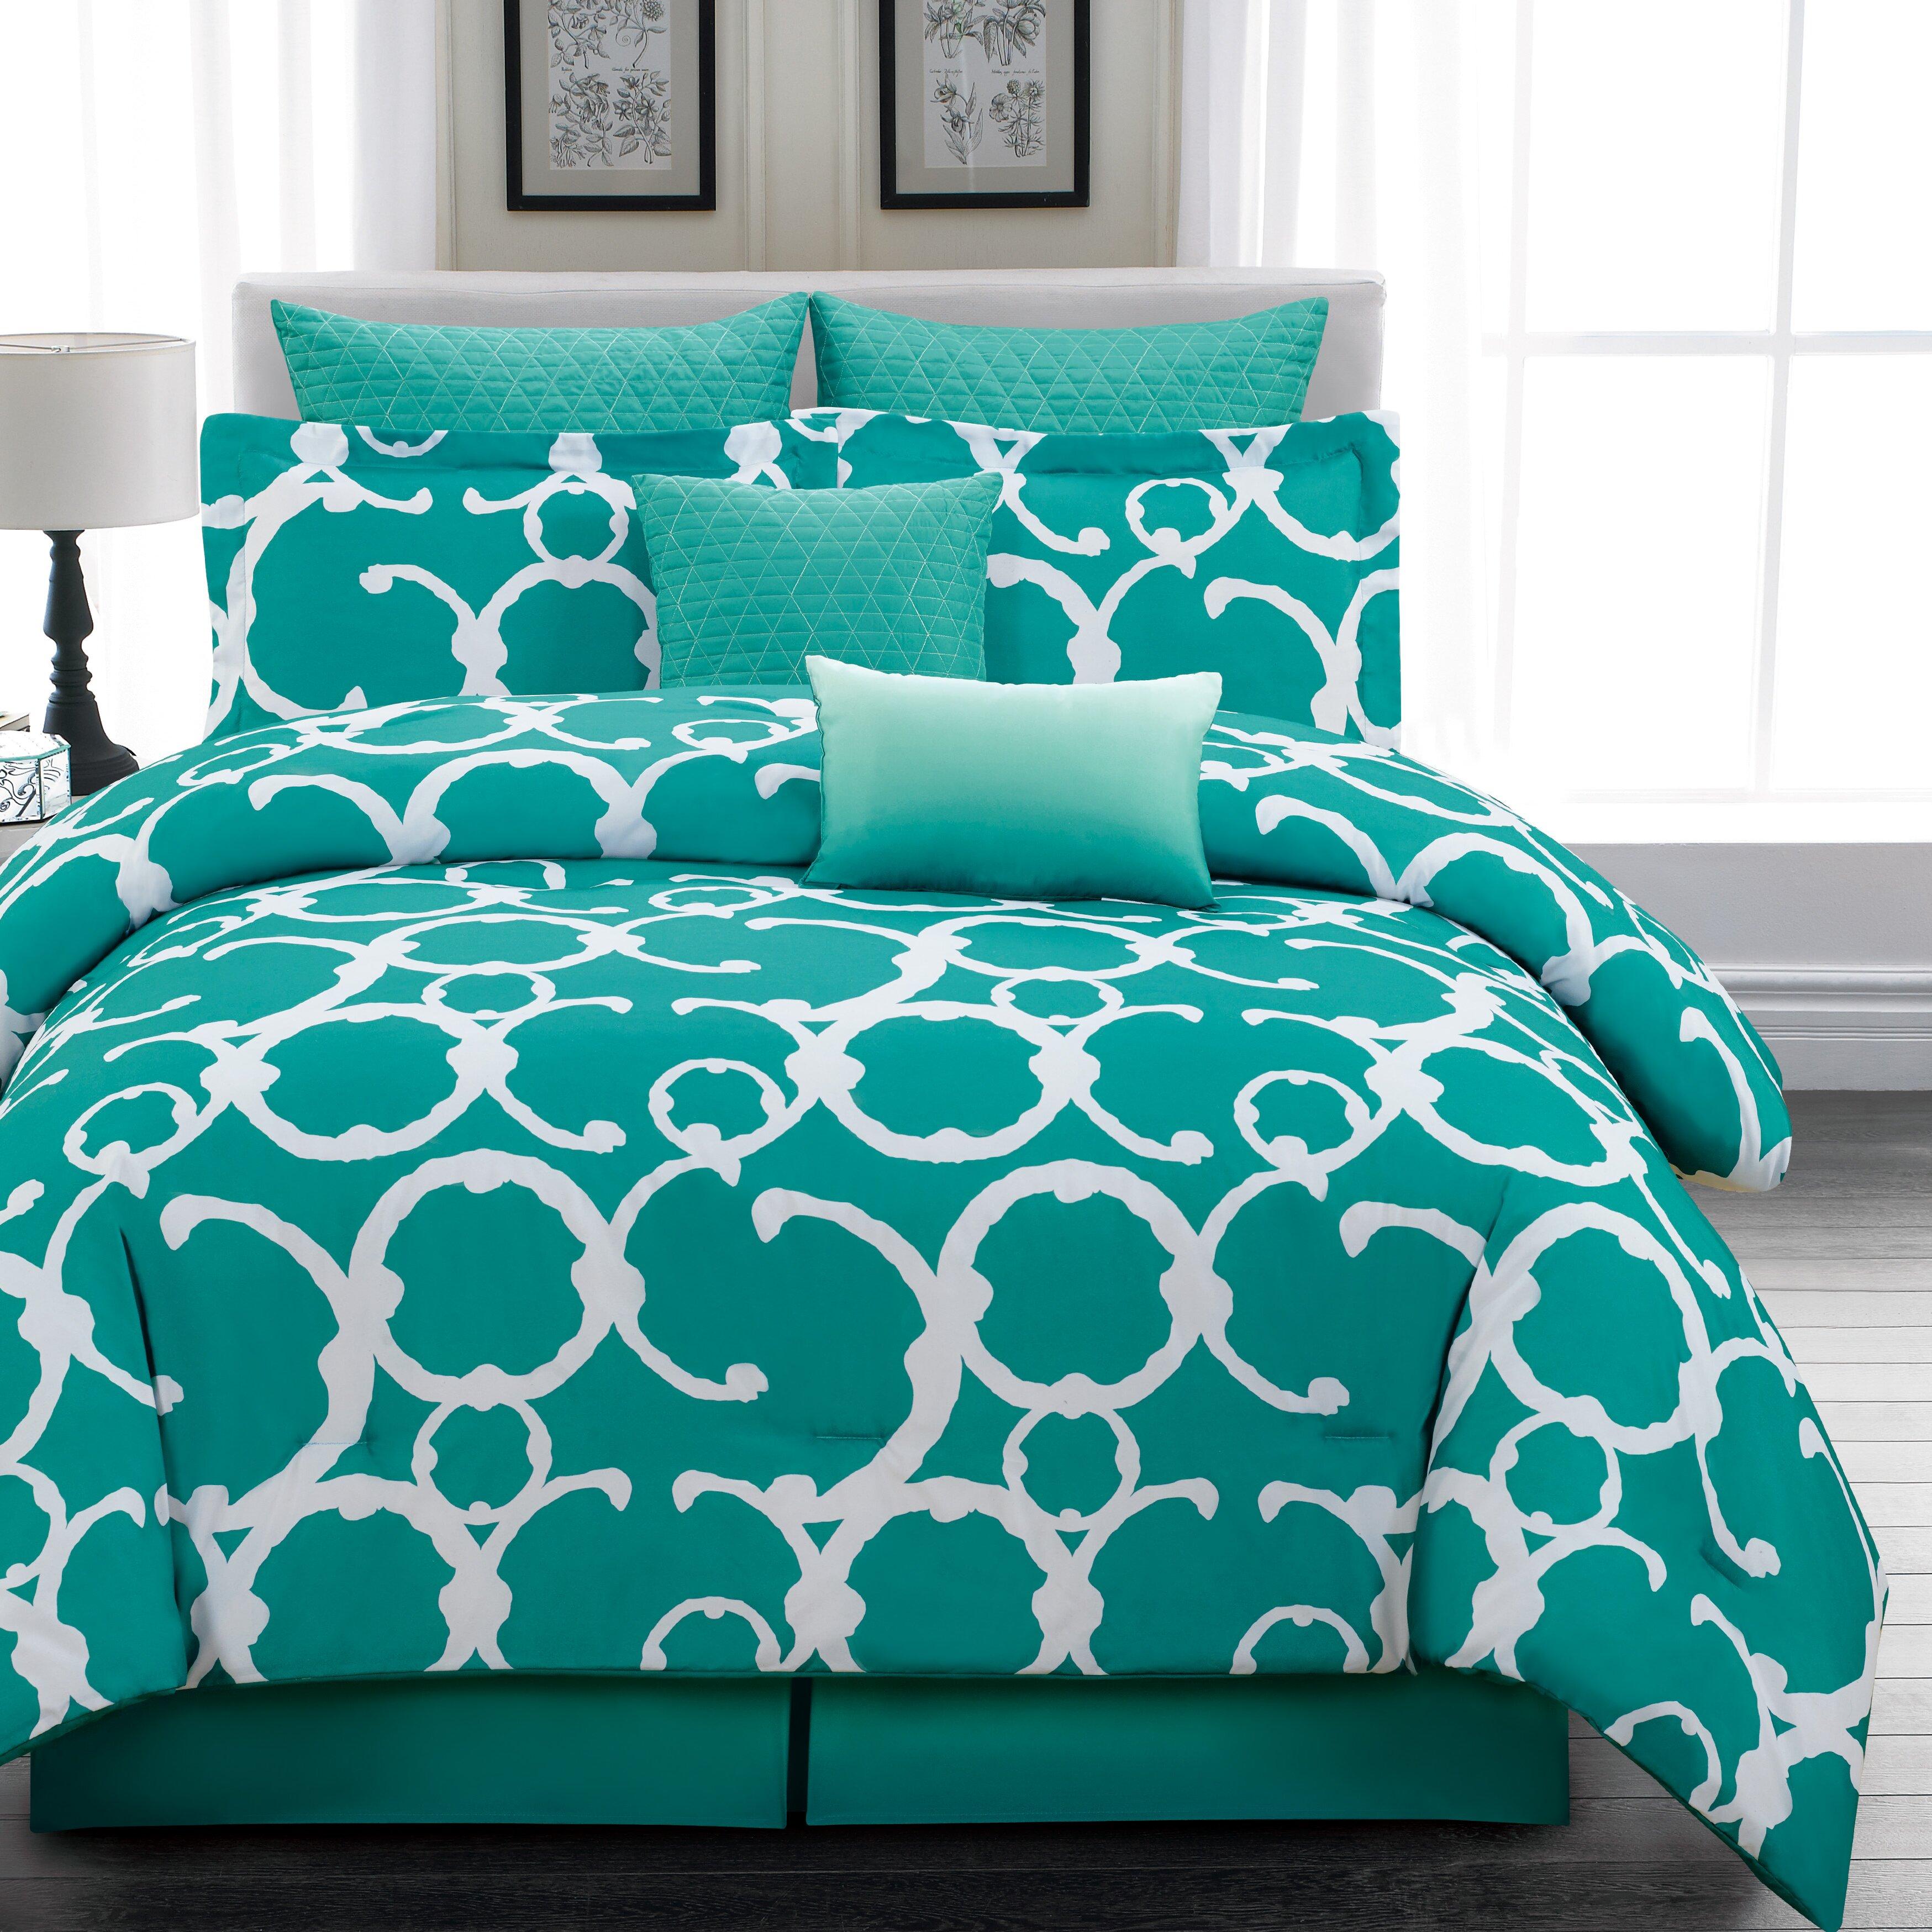 dr international rhys 7 piece comforter set reviews wayfair. Black Bedroom Furniture Sets. Home Design Ideas